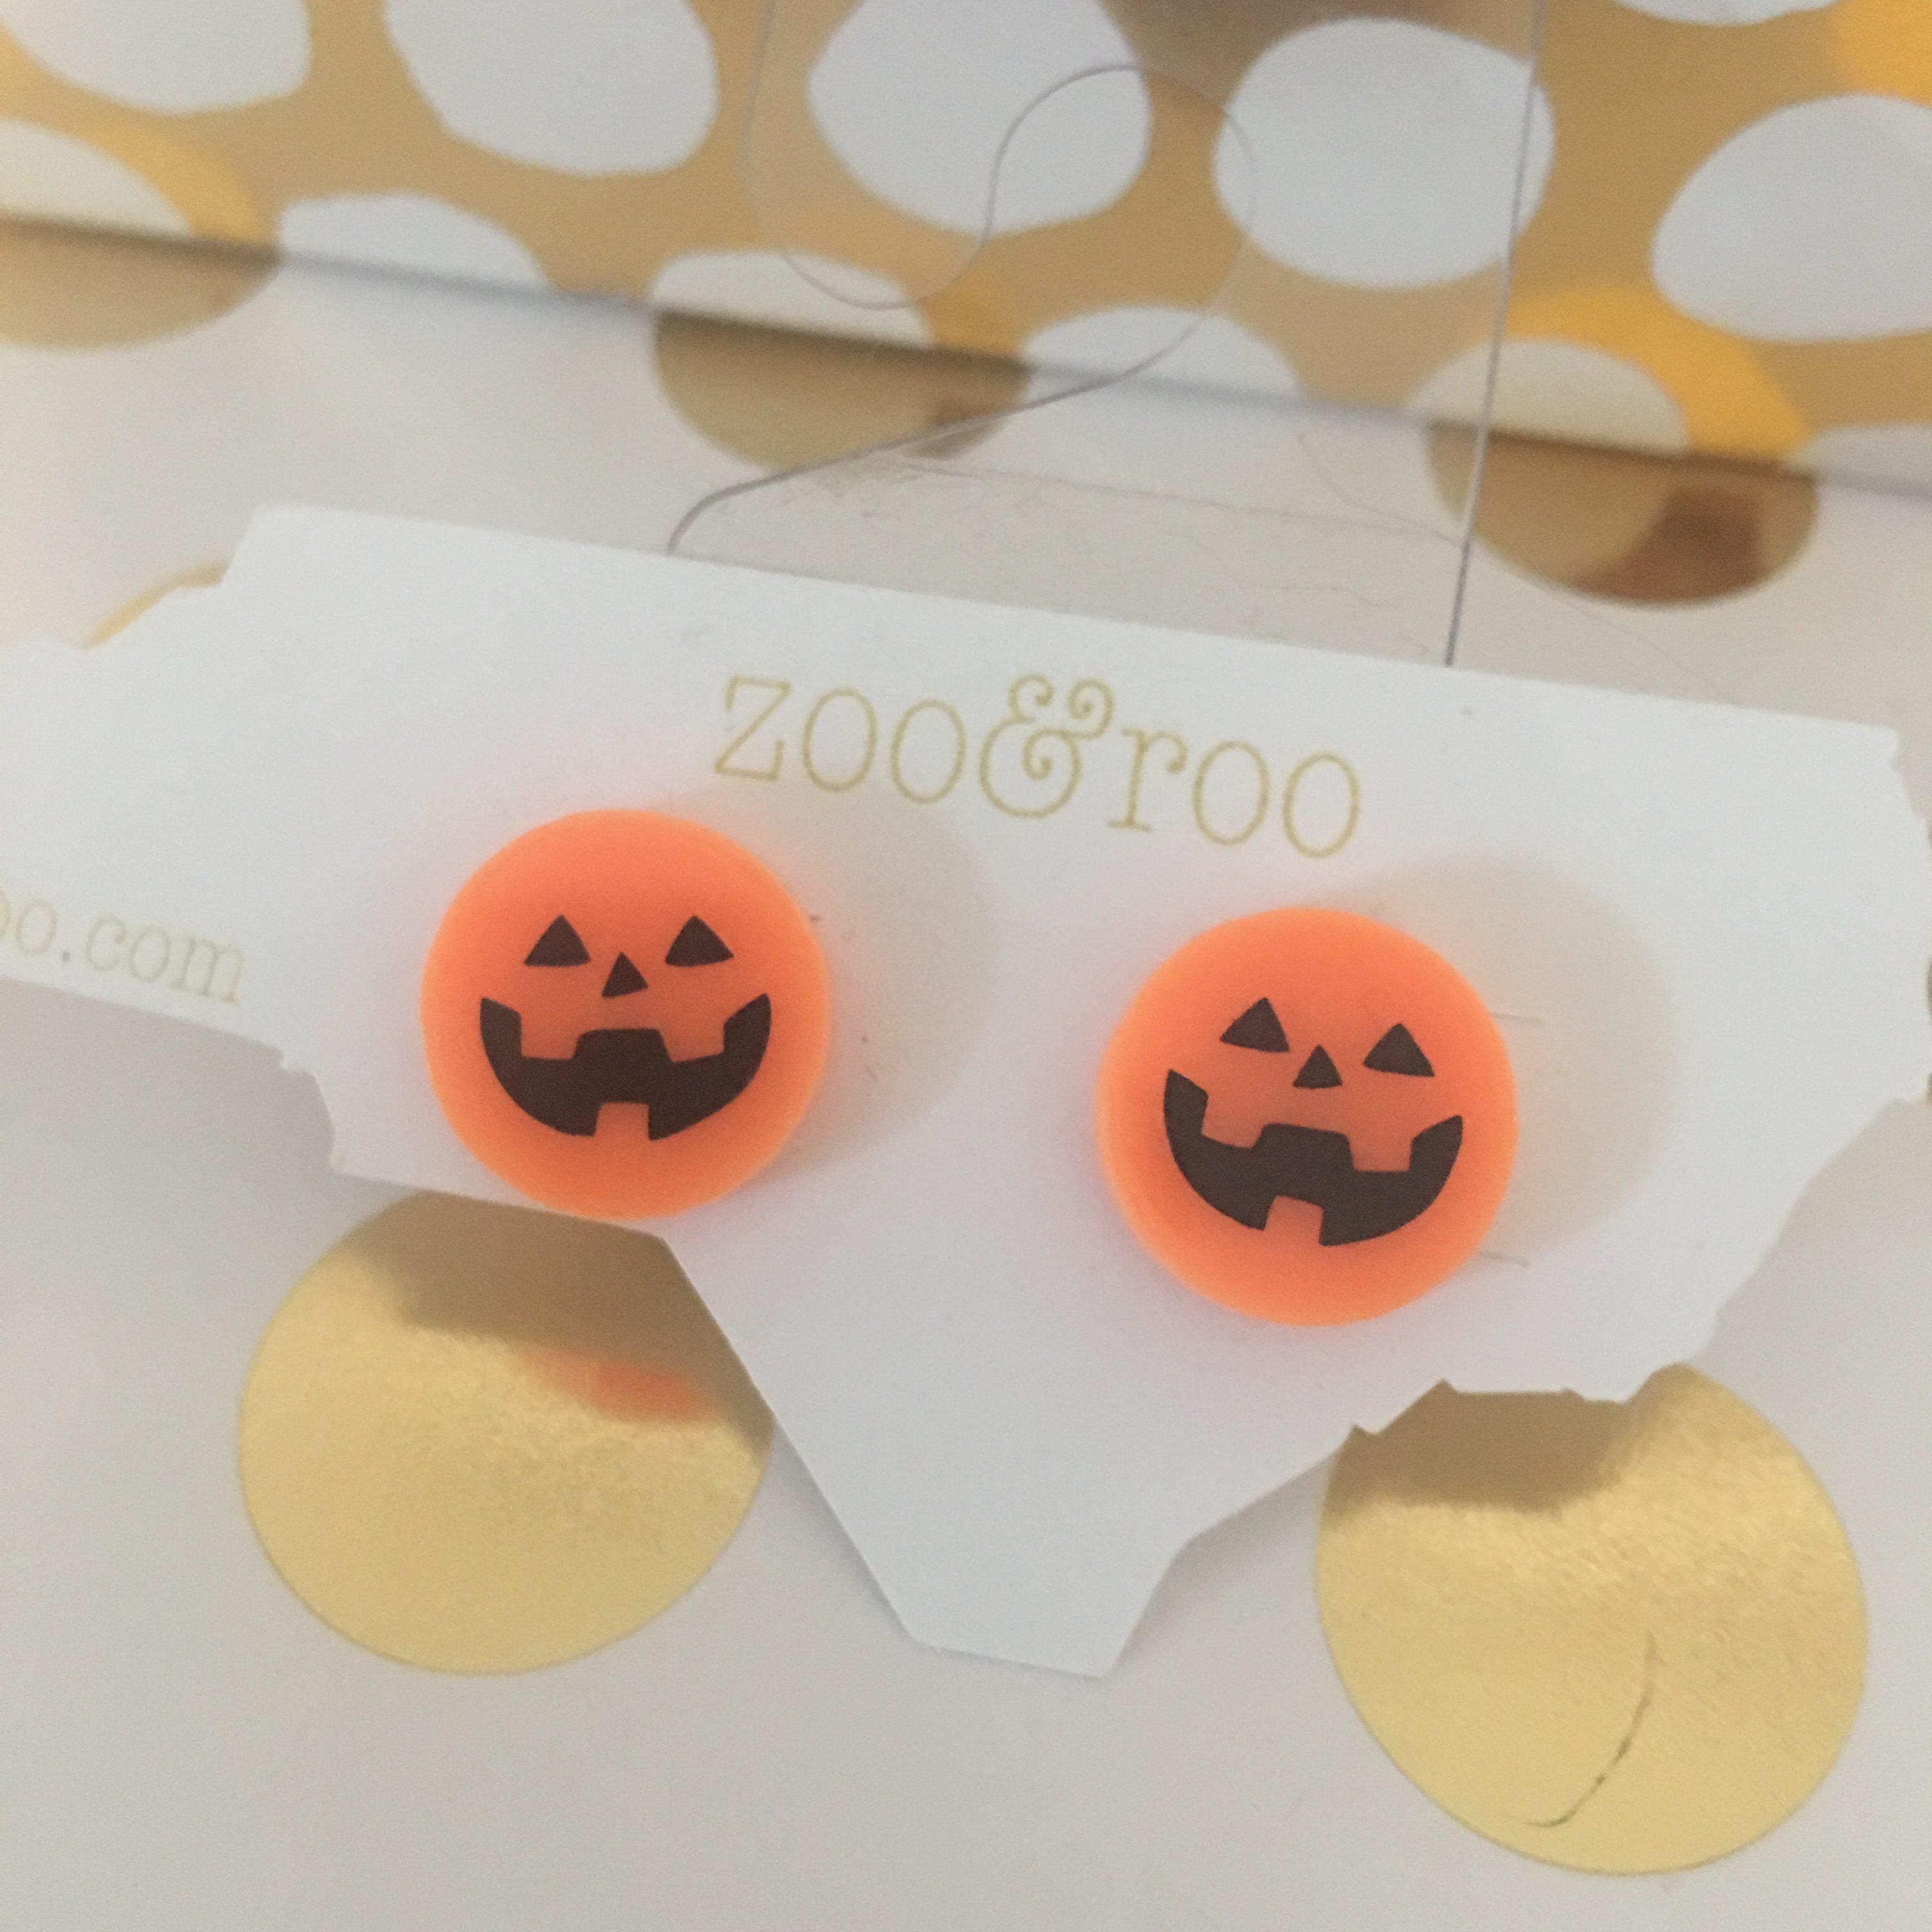 Jack-o-lantern earrings